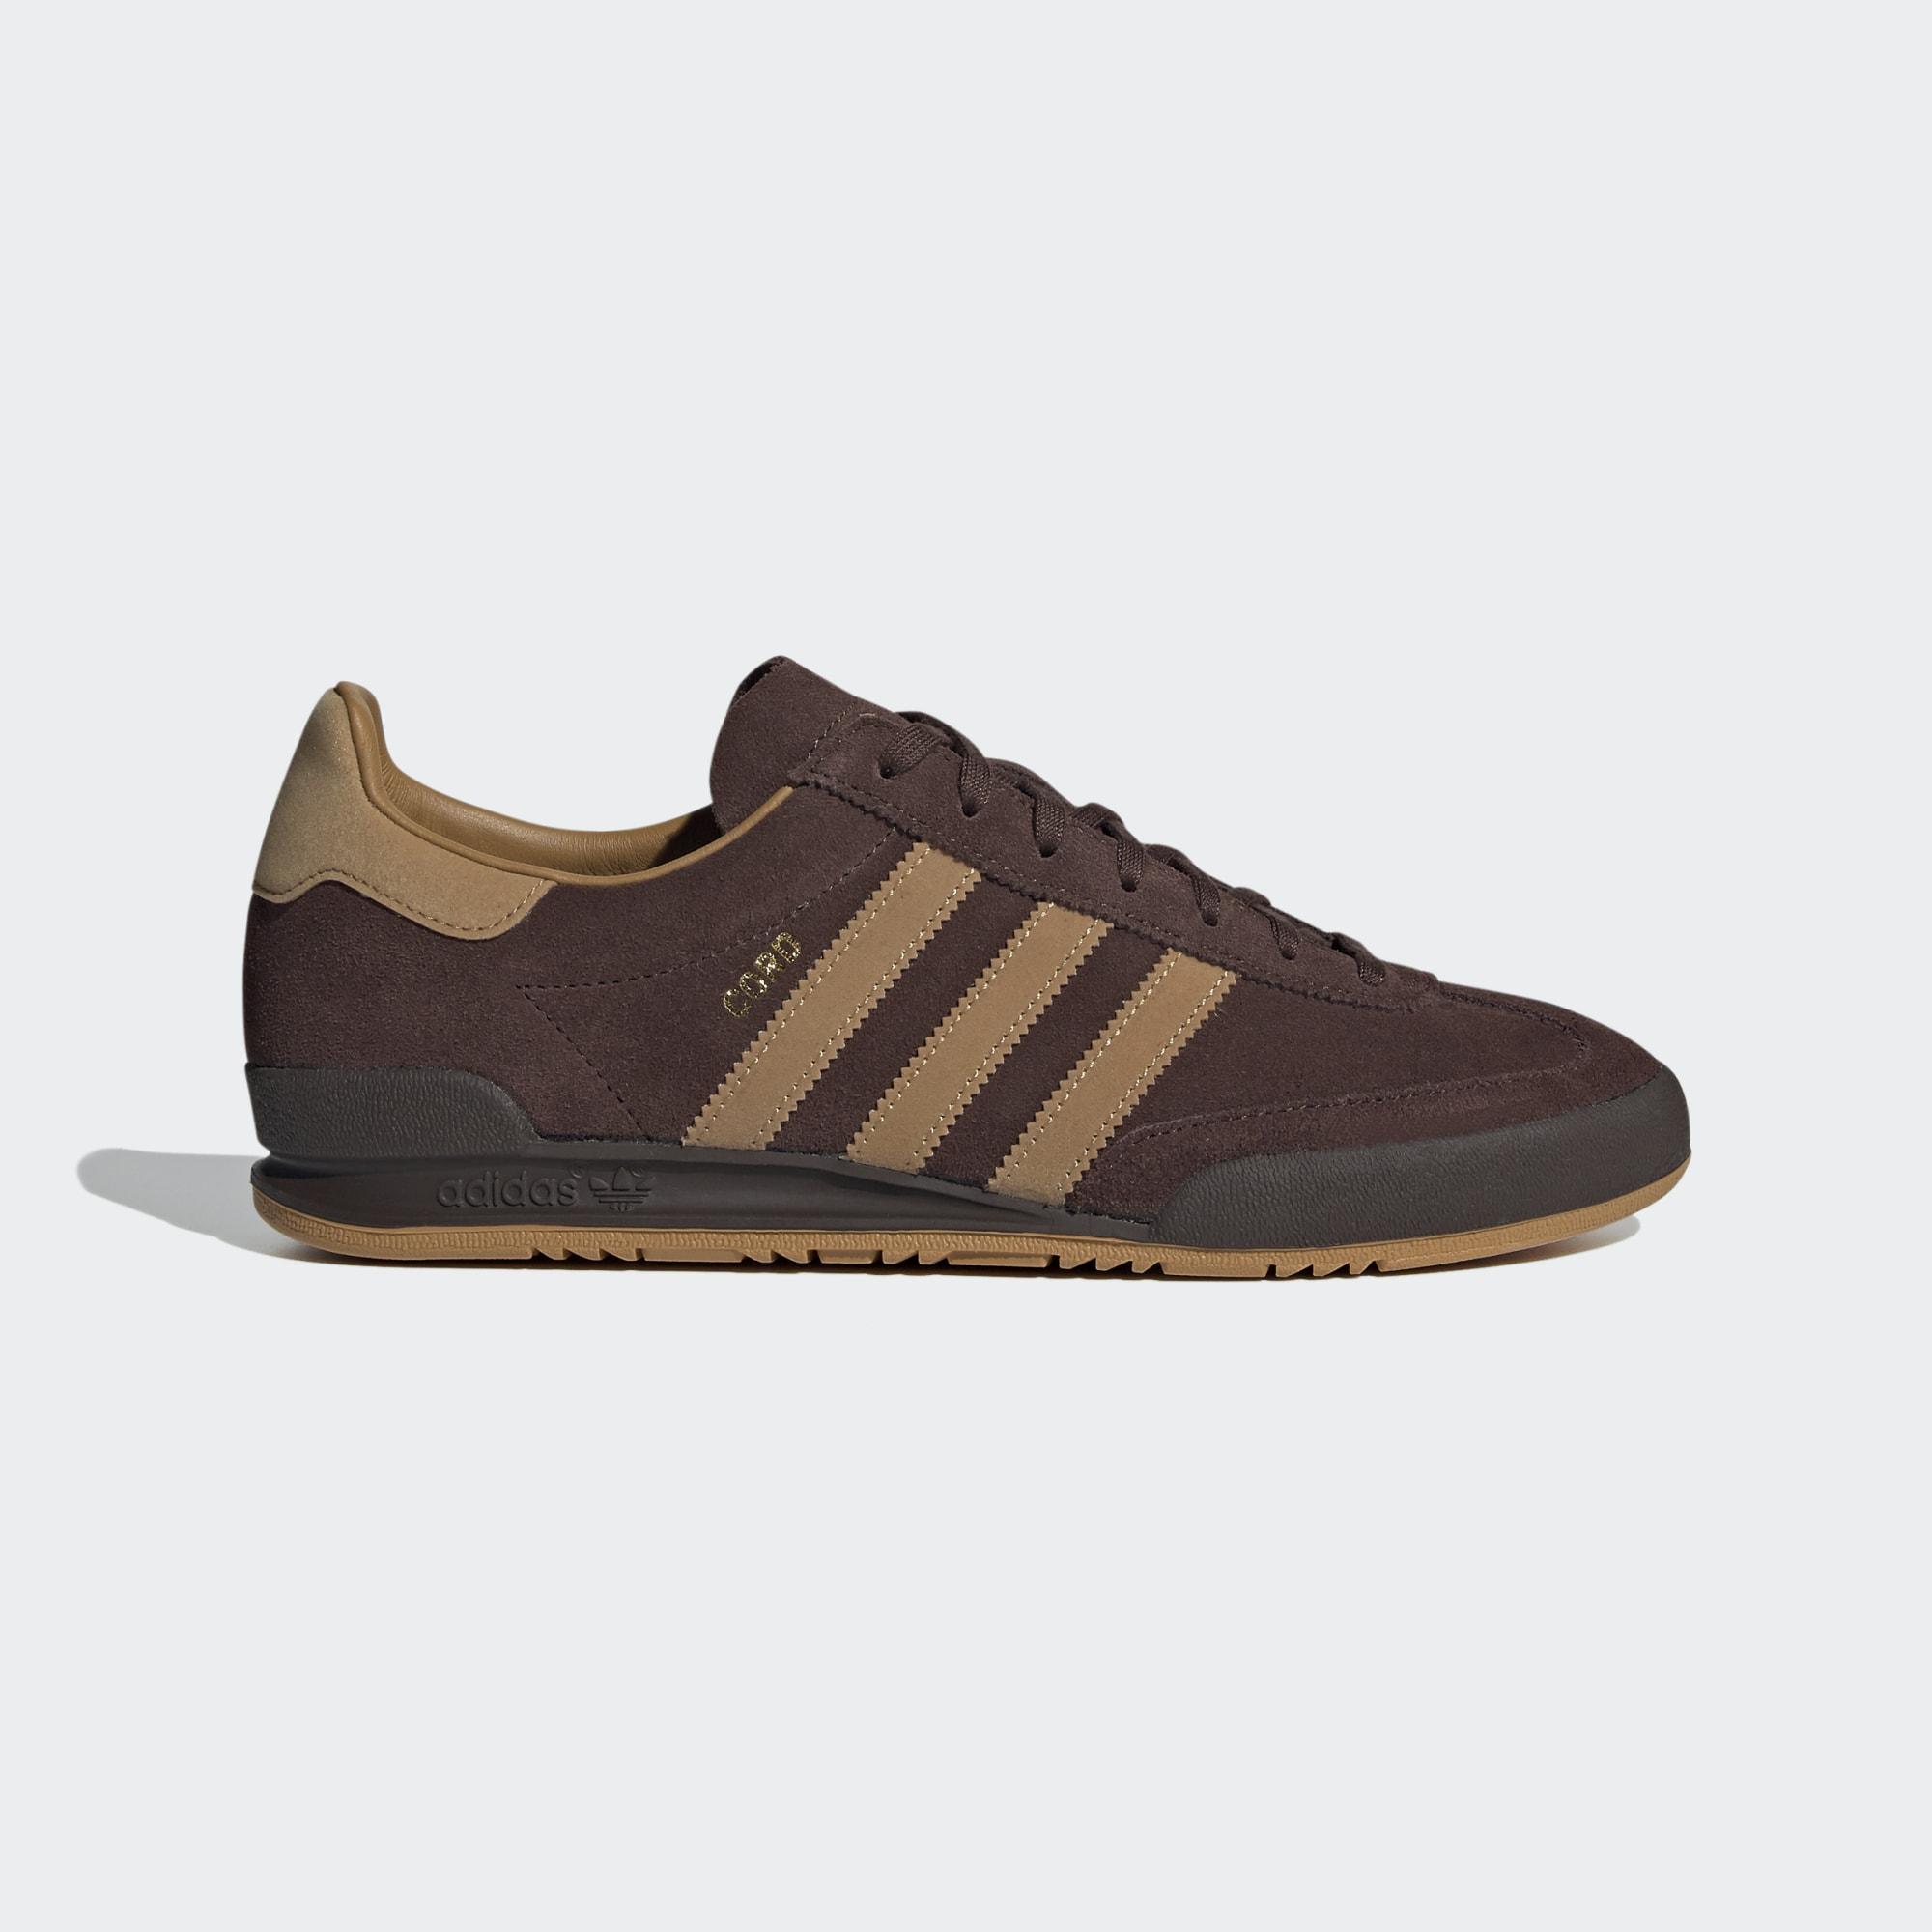 Cord_Shoes_Brun_H67630_01_standard.jpg